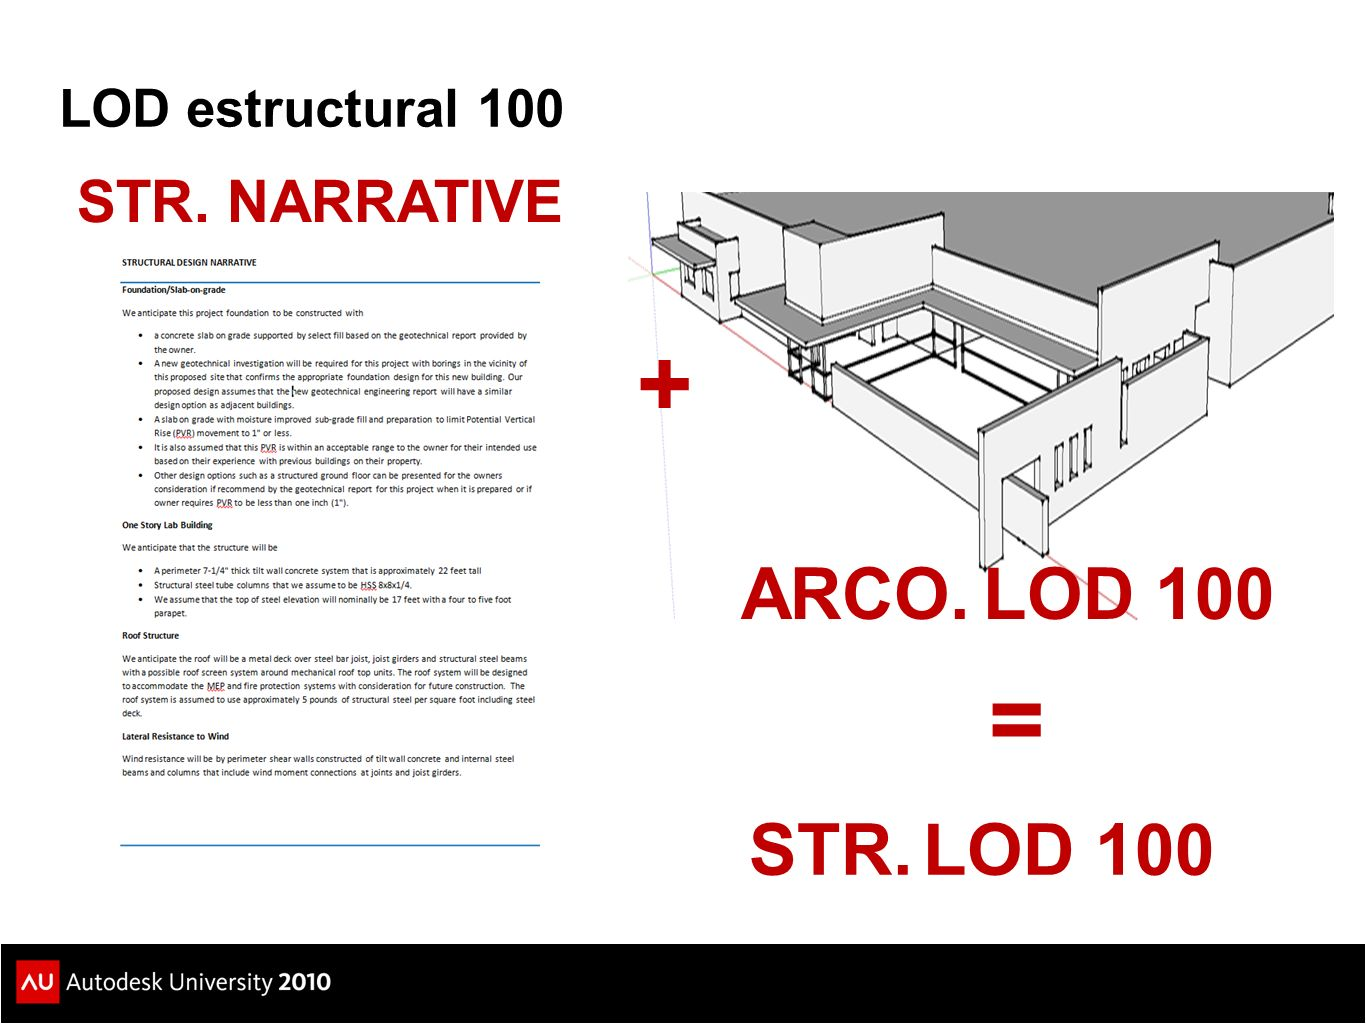 LOD estructural 100 STR. NARRATIVE ARCO. LOD 100 + = STR. LOD 100